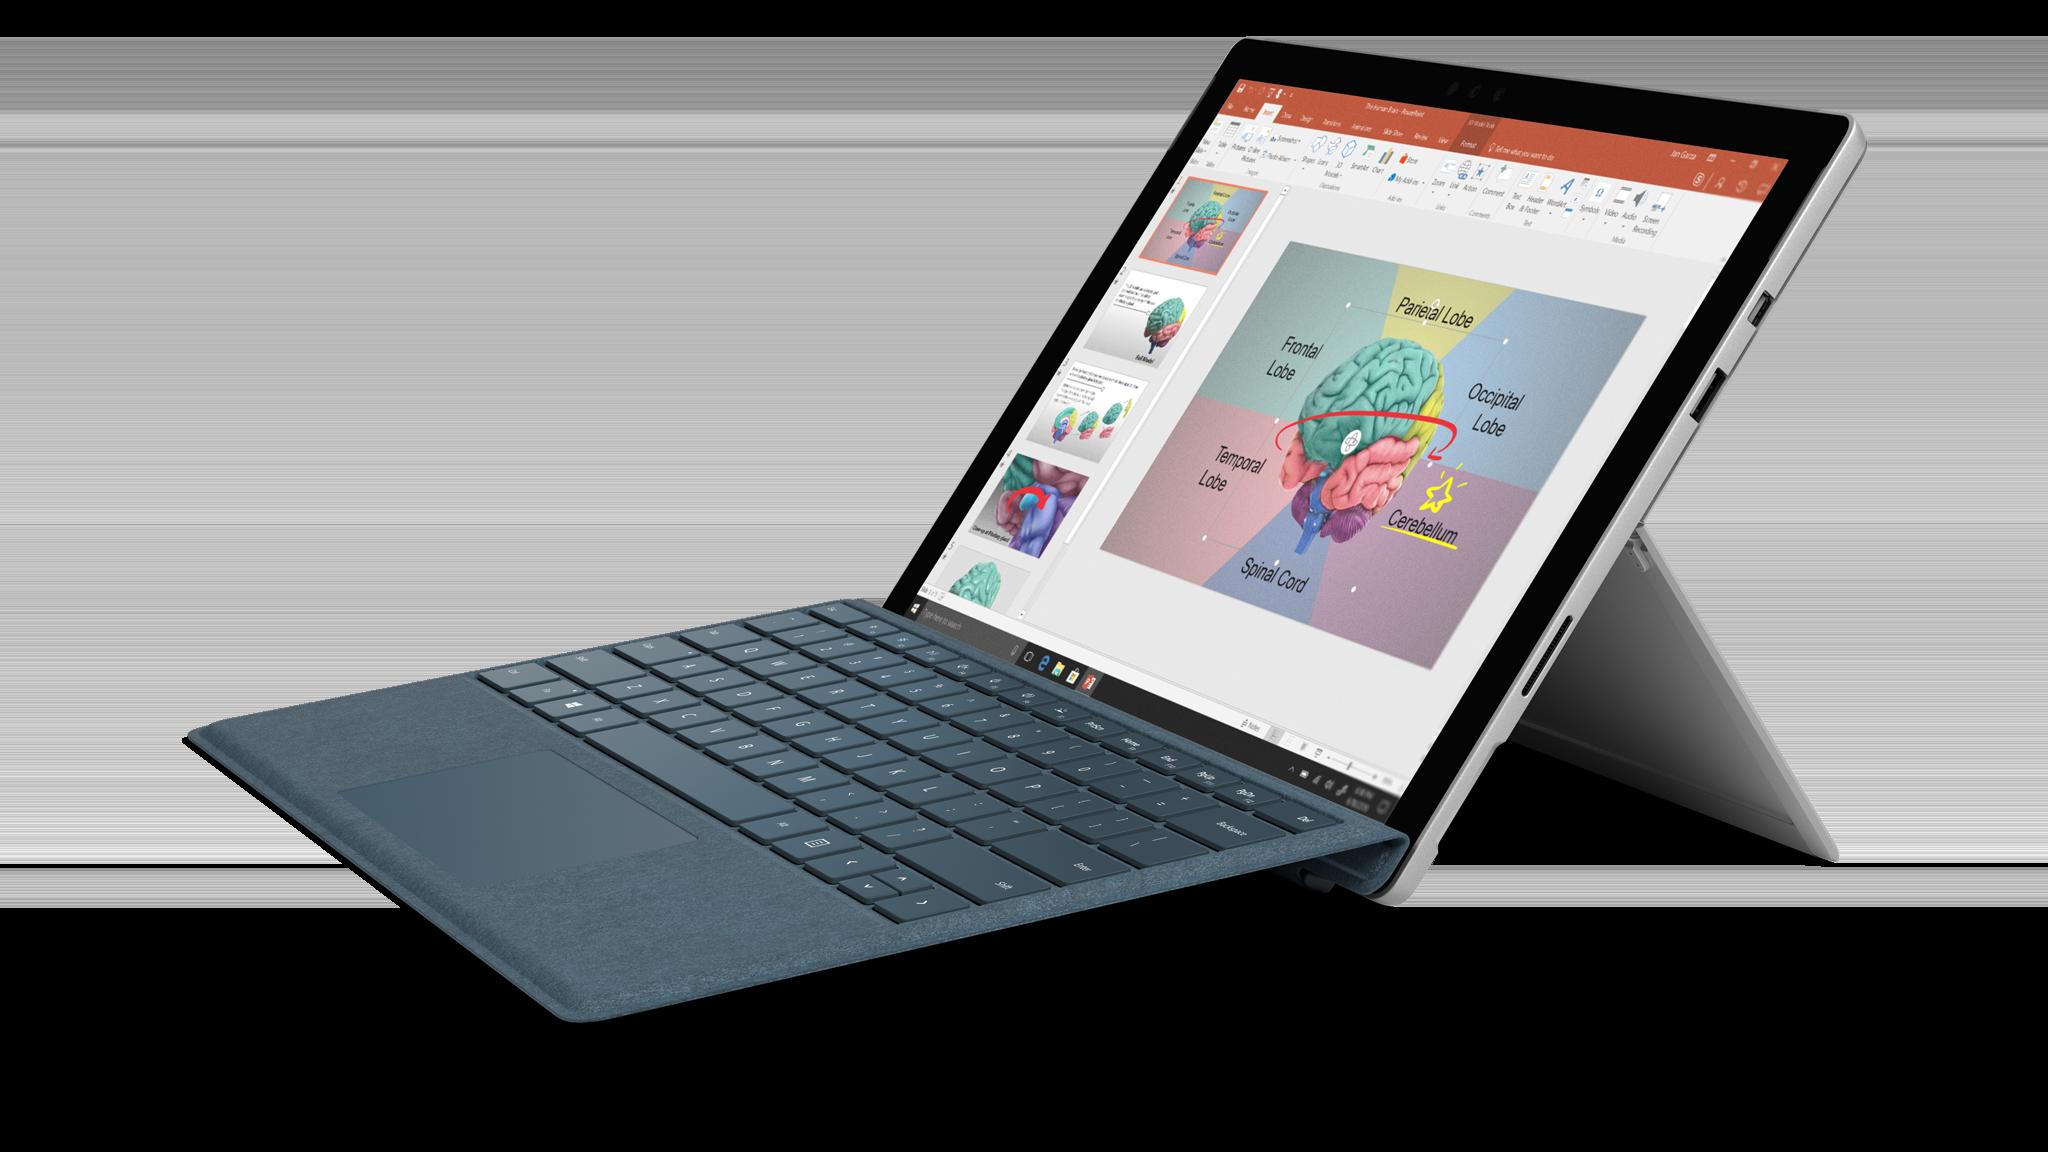 Surface Pro 側面畫面